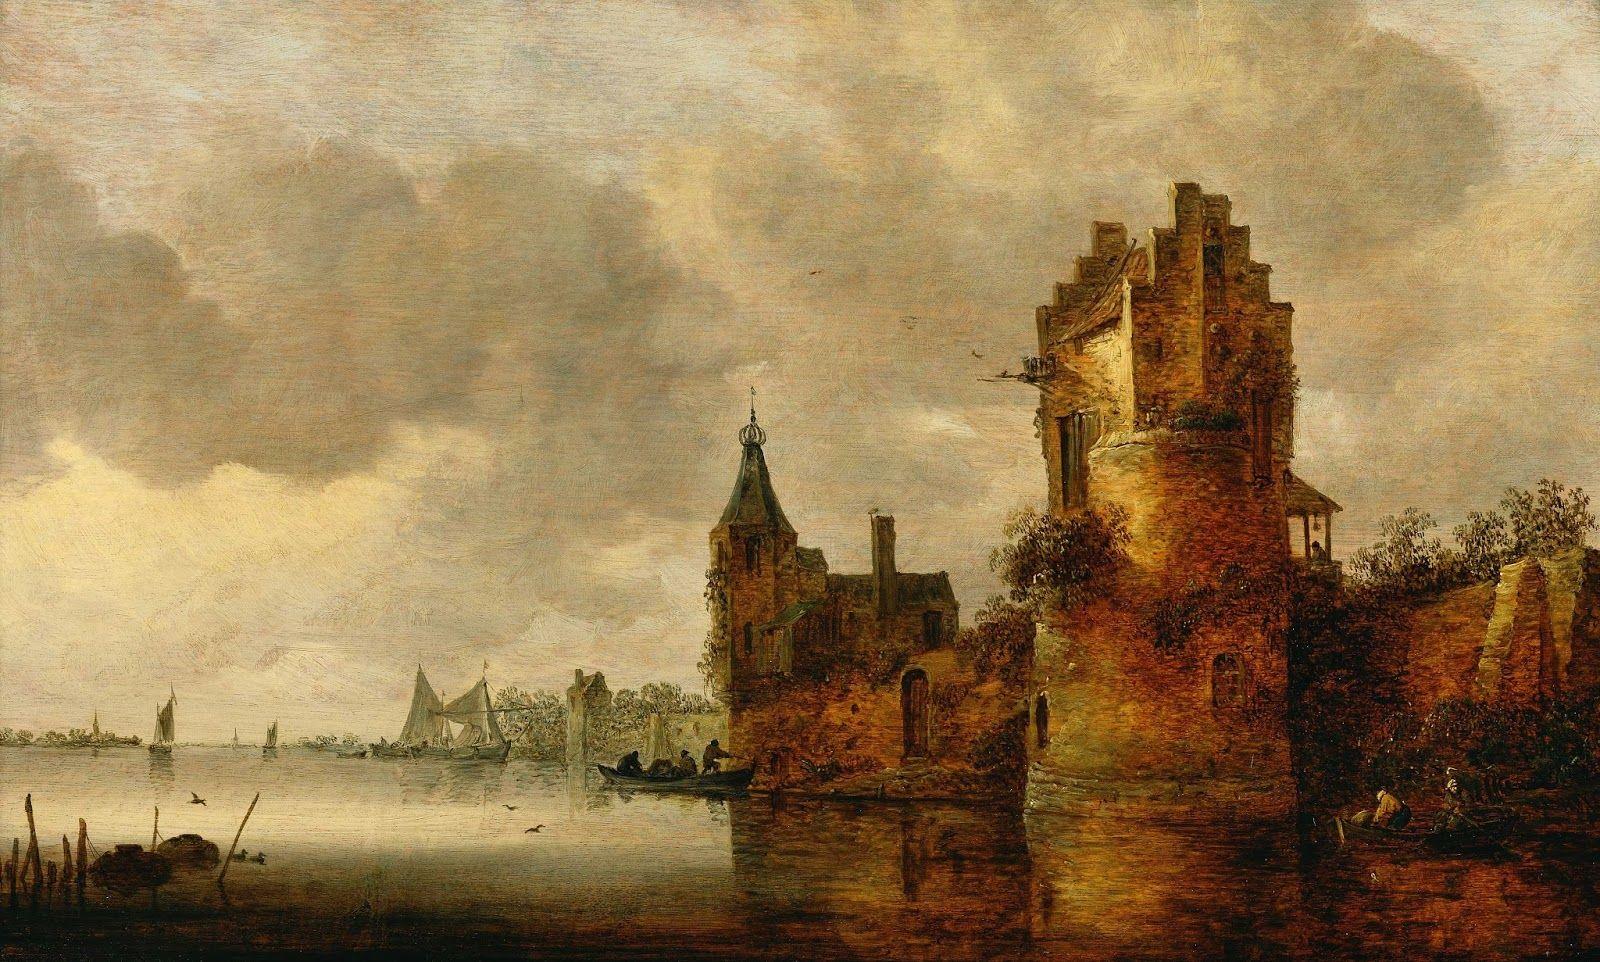 Estuary with Round Tower by Jan van Goyen